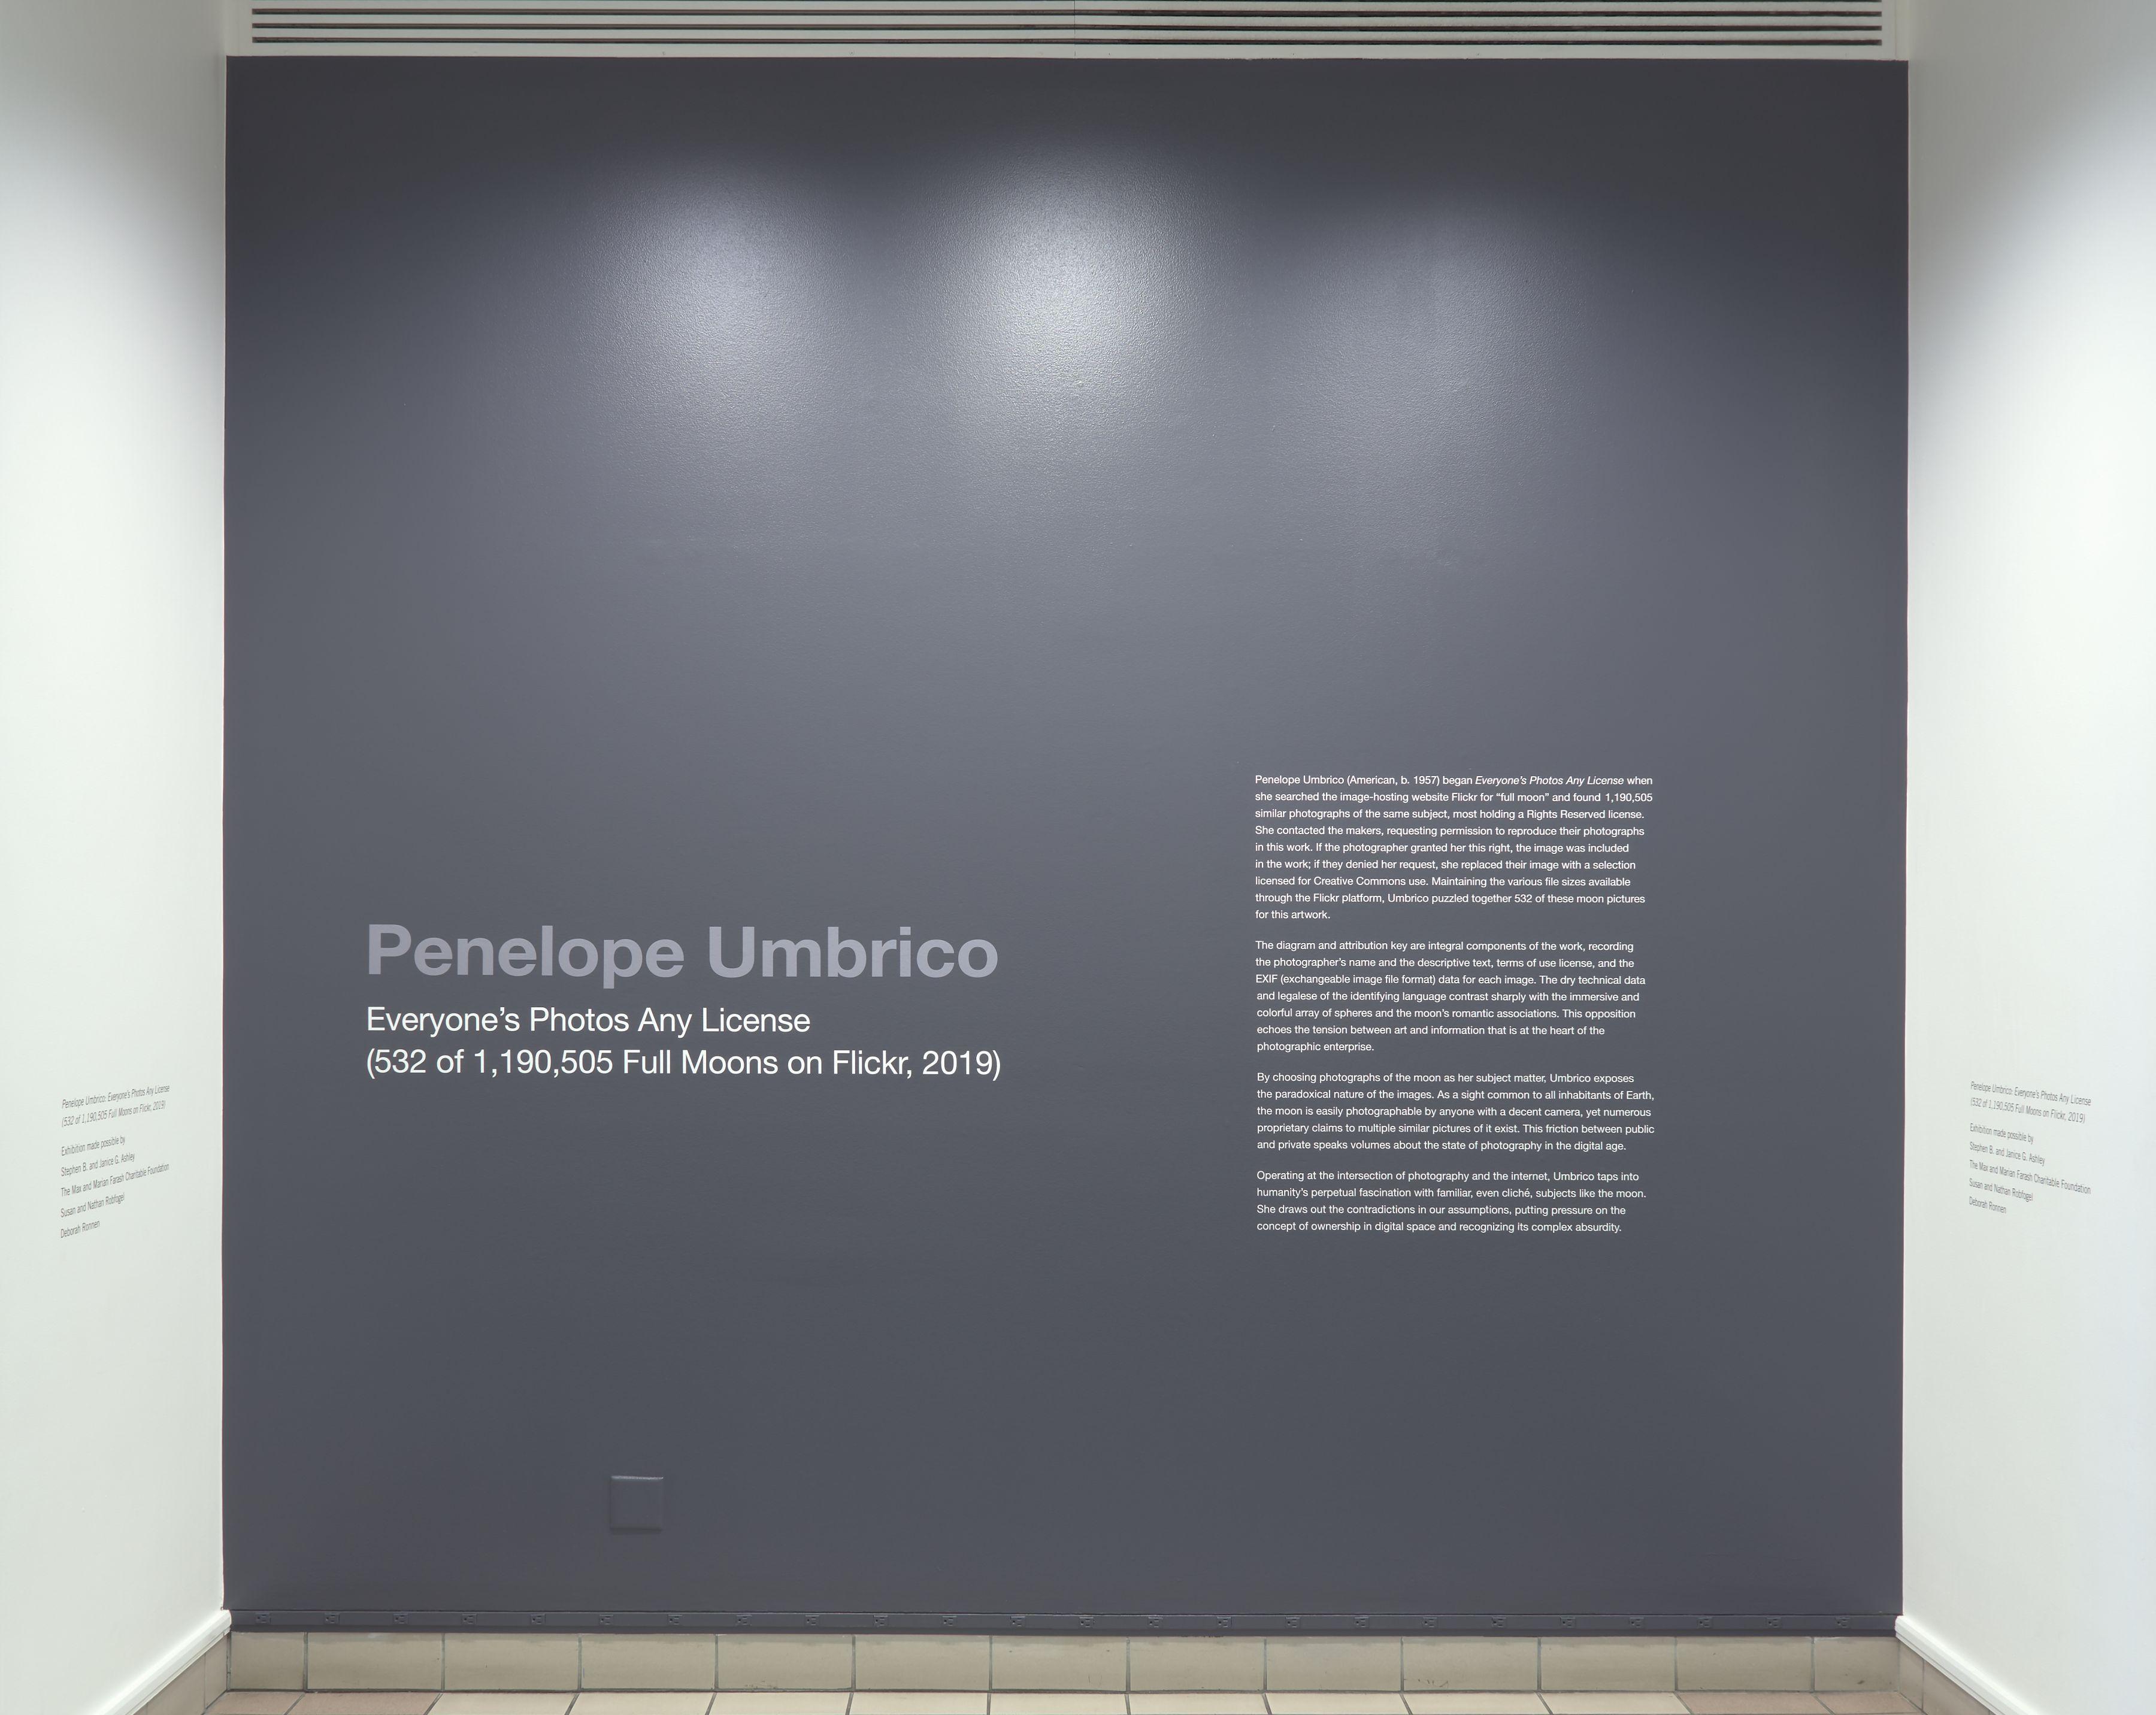 Penelope Umbrico | Everyone's Photo Any License